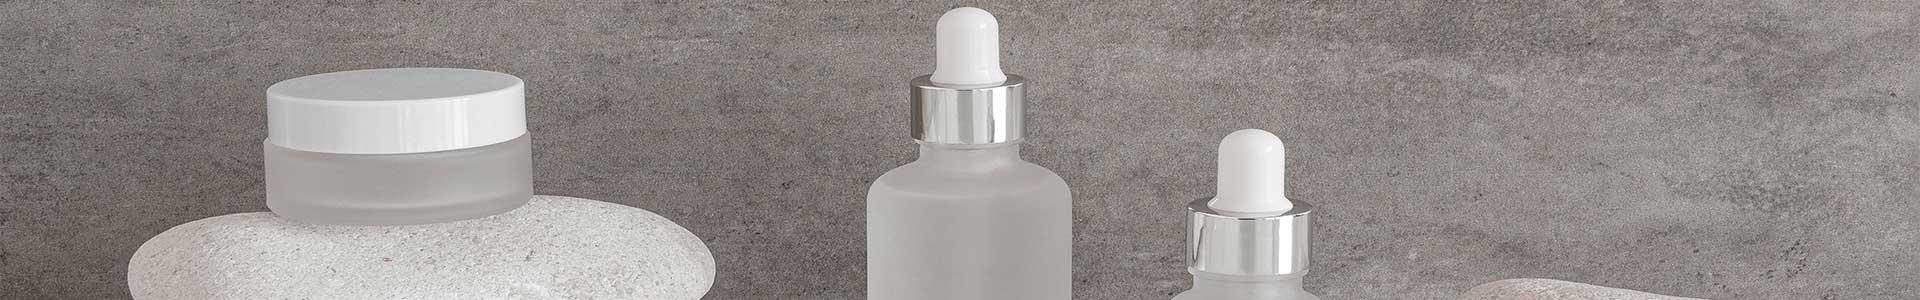 enquiry for glass bottles jars vials